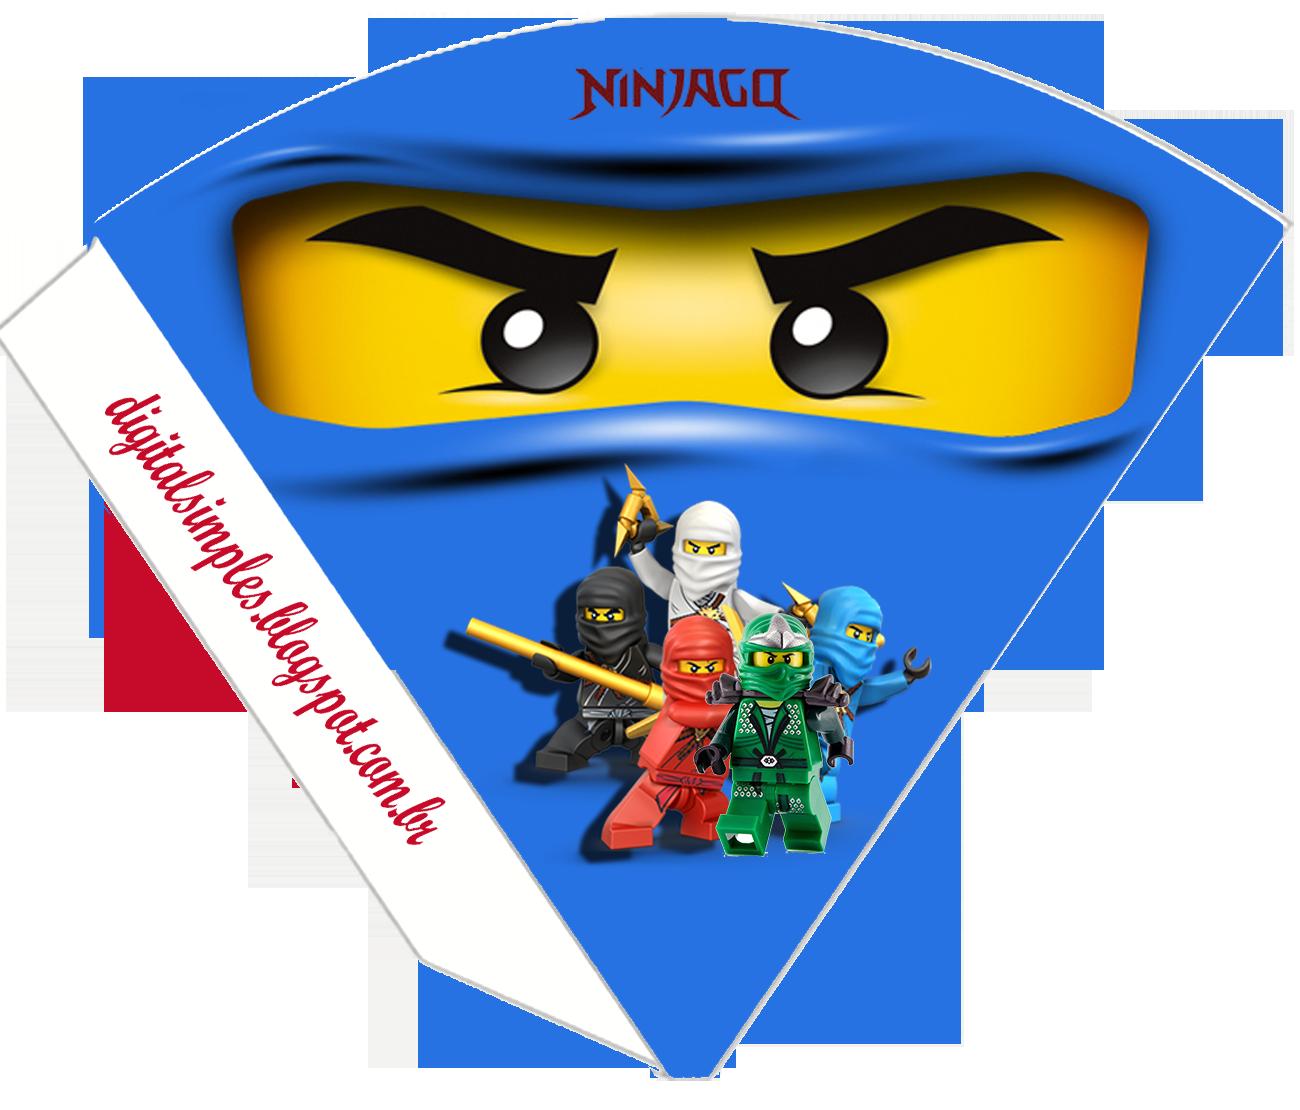 Ninjago star clipart picture freeuse library Kit Digital Aniversário